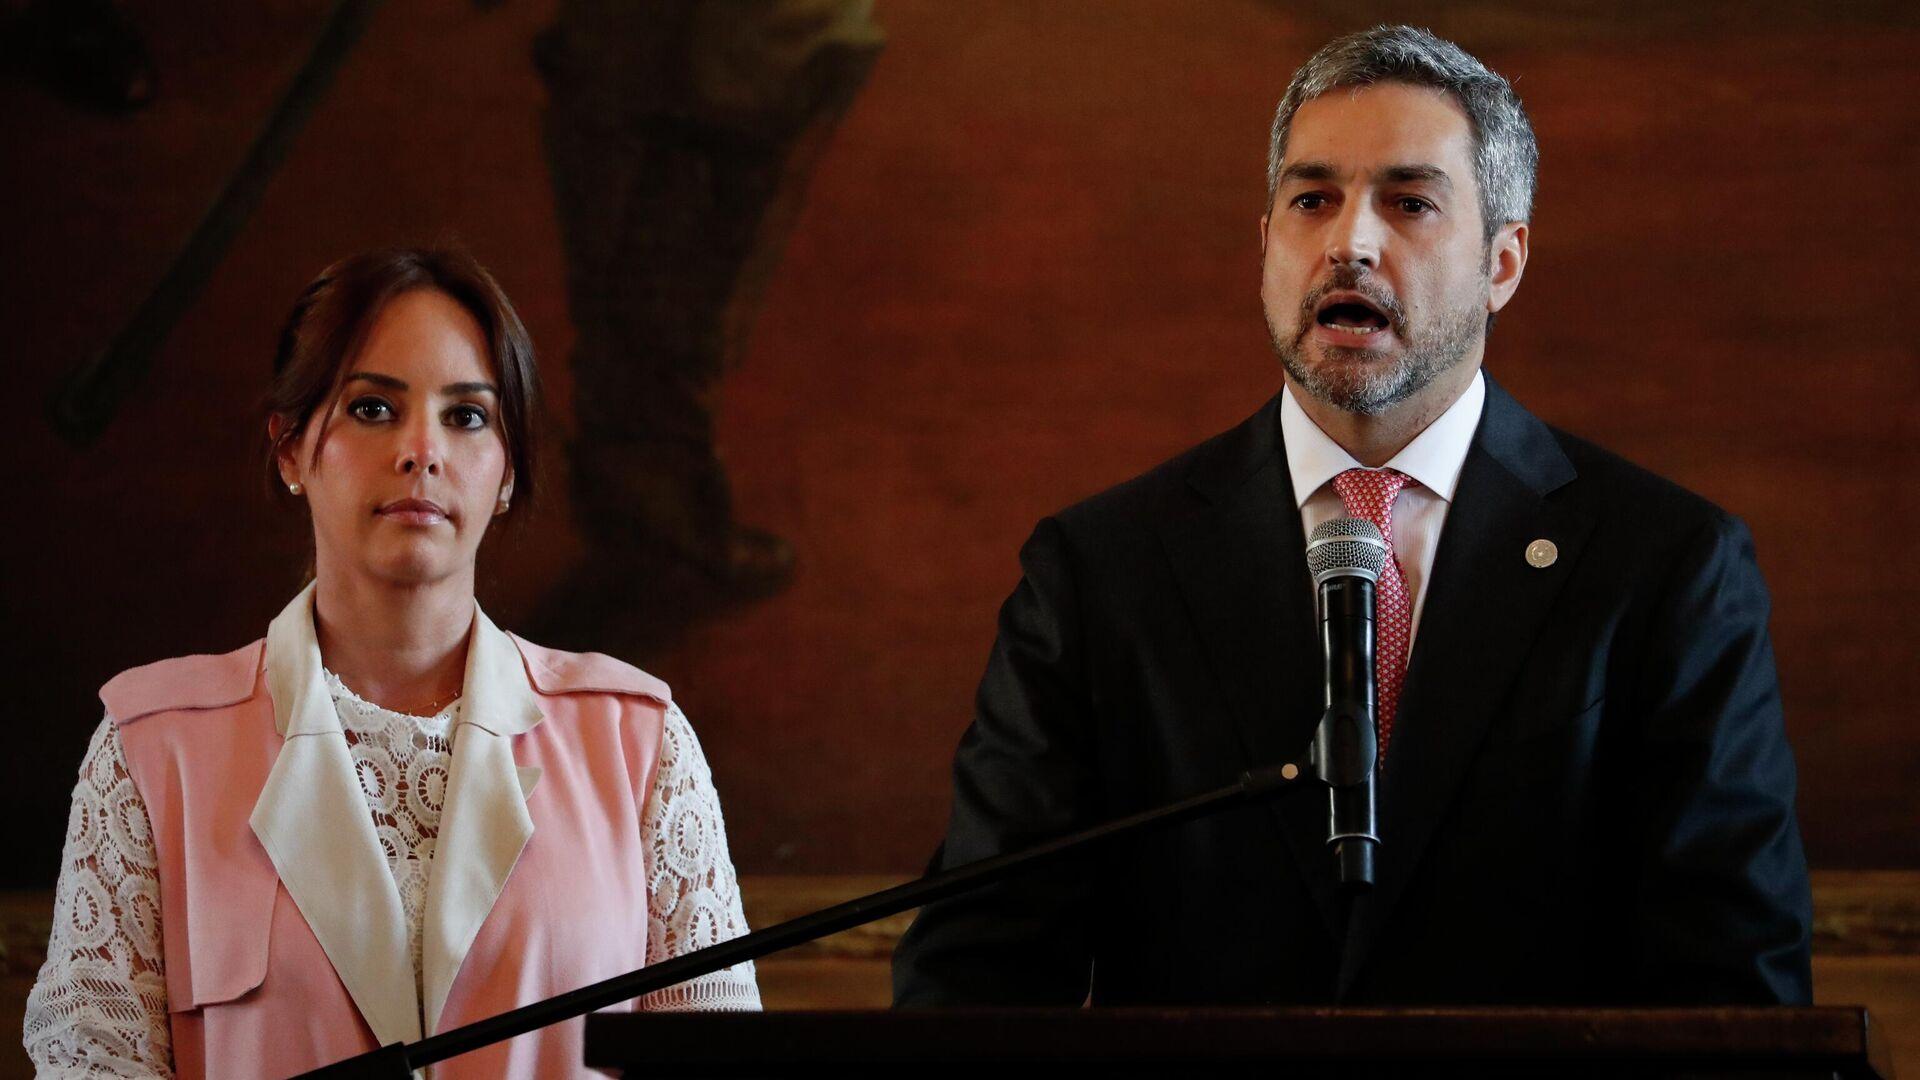 Mario Abdo Benitez, presidente de Paraguay, y Silvana  Abdo, primera dama (archivo) - Sputnik Mundo, 1920, 25.06.2021